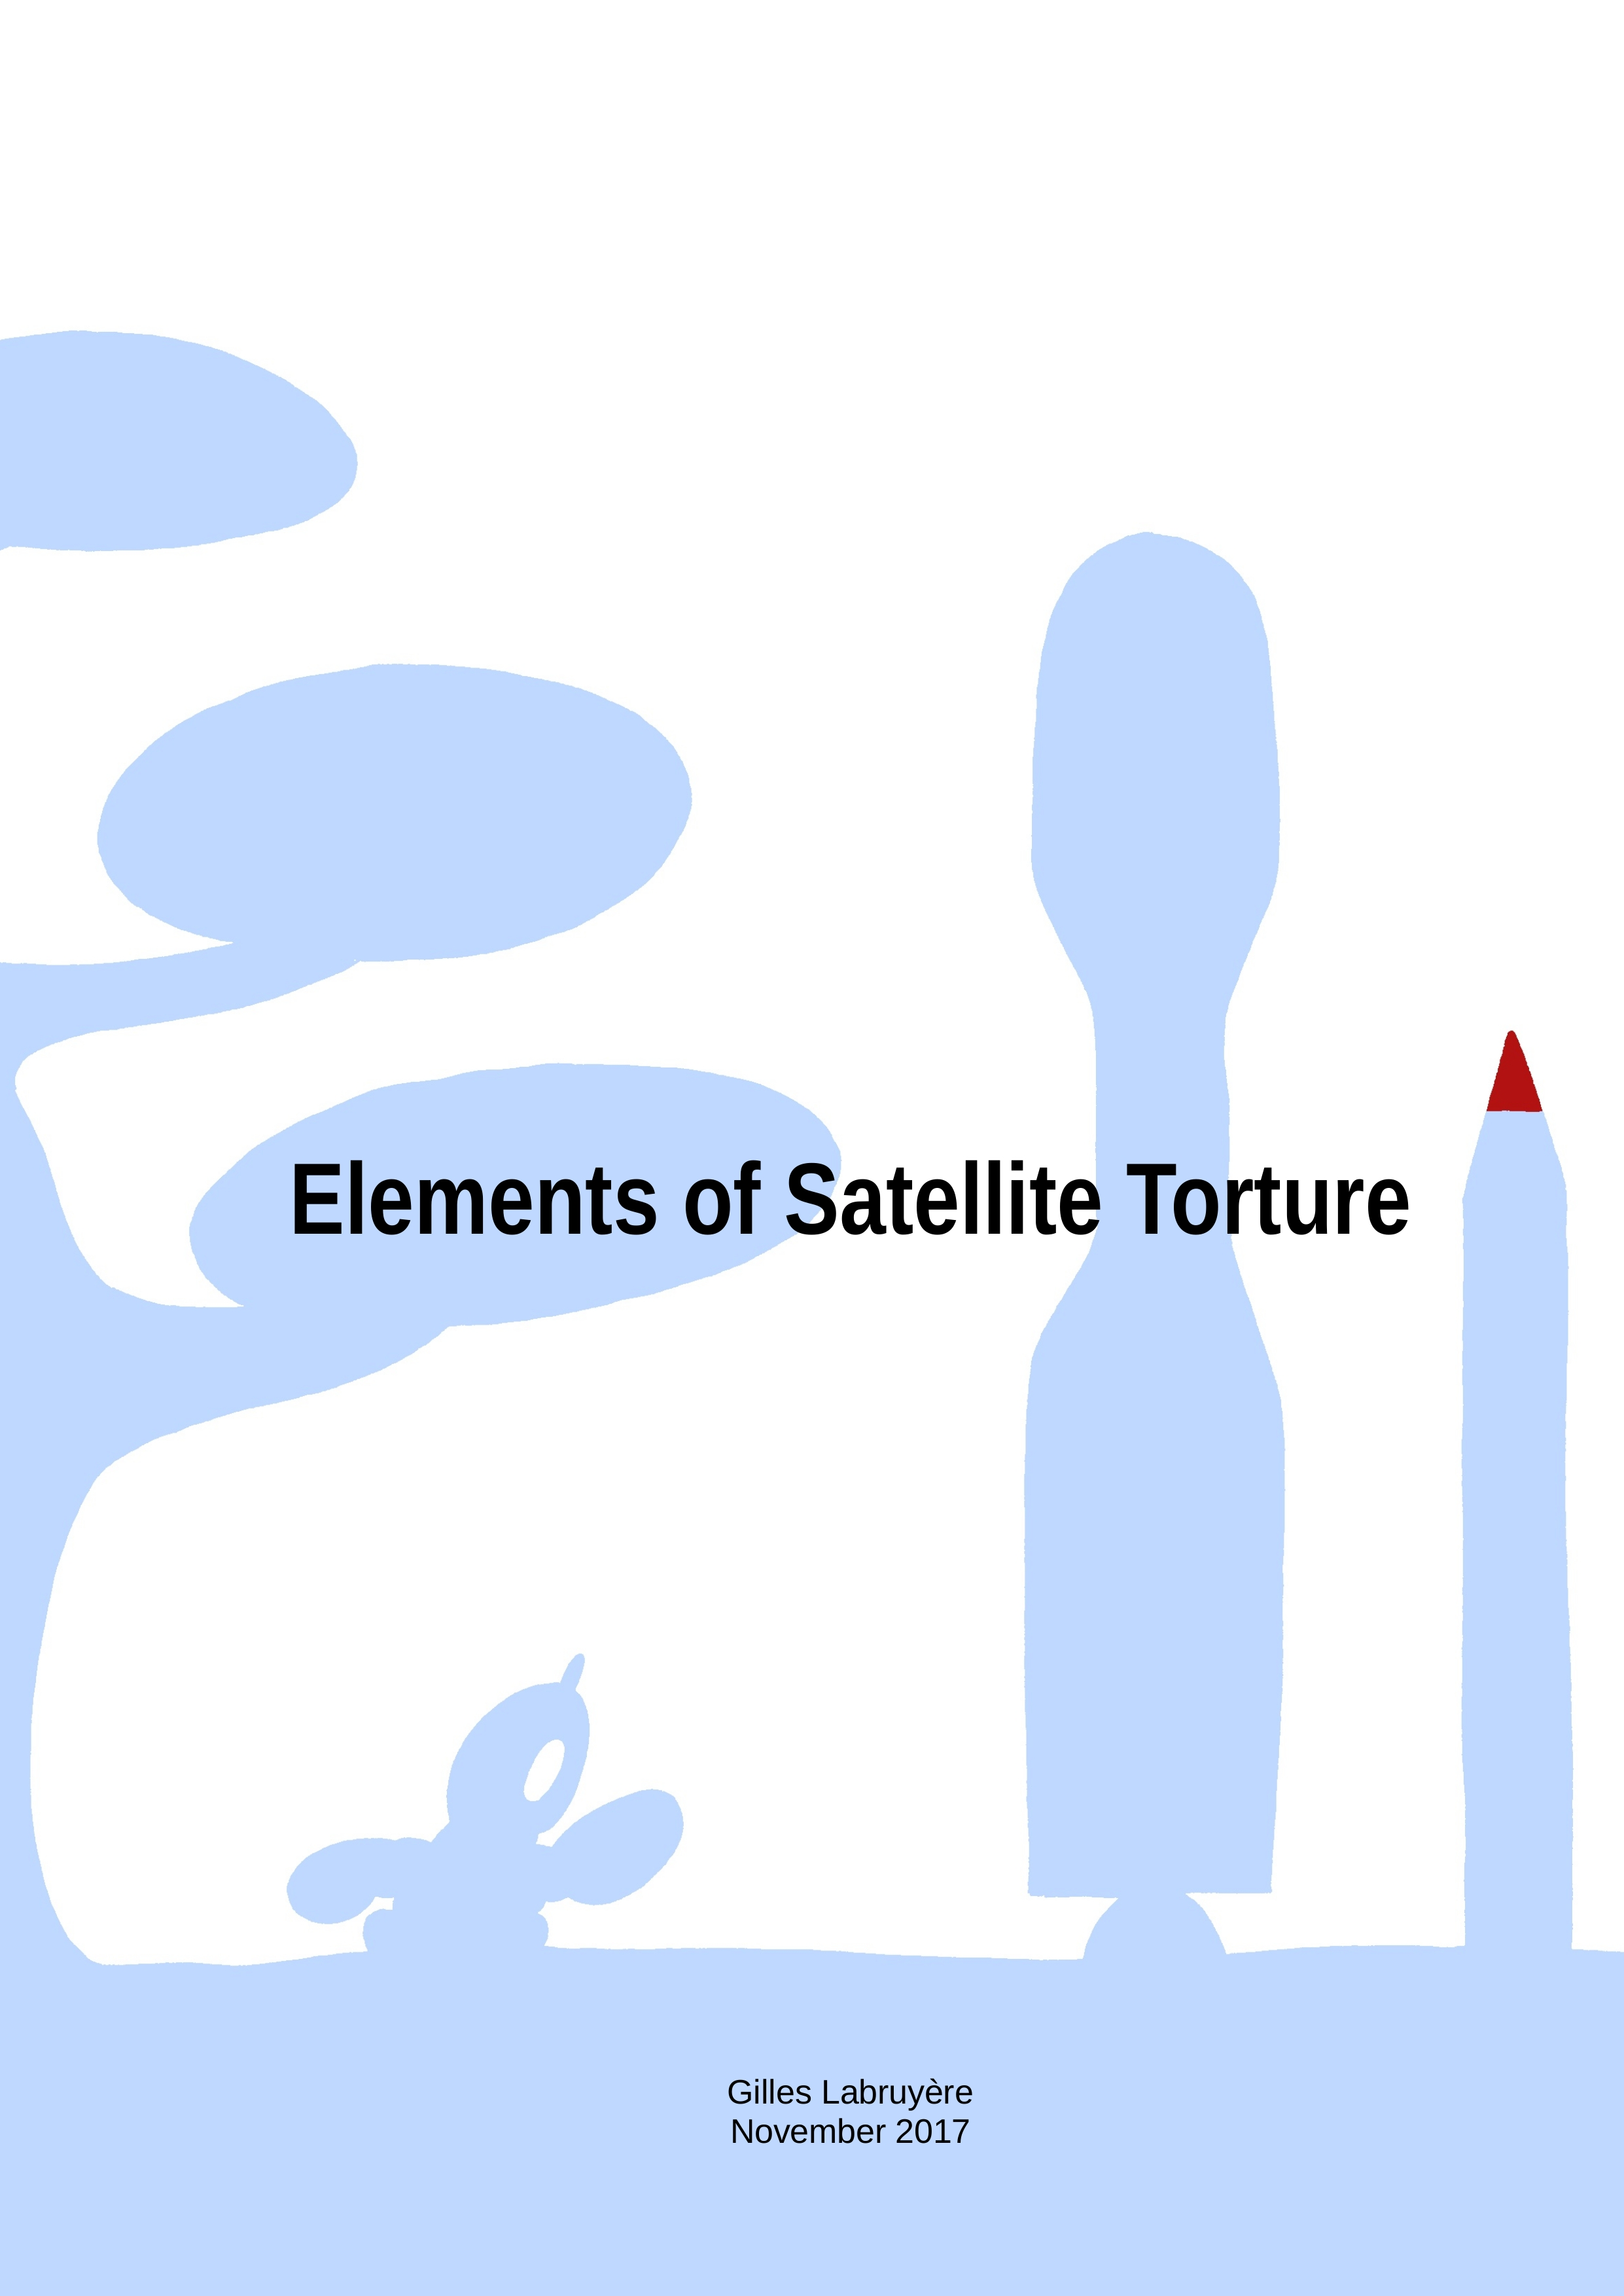 Elements of Satellite Torture